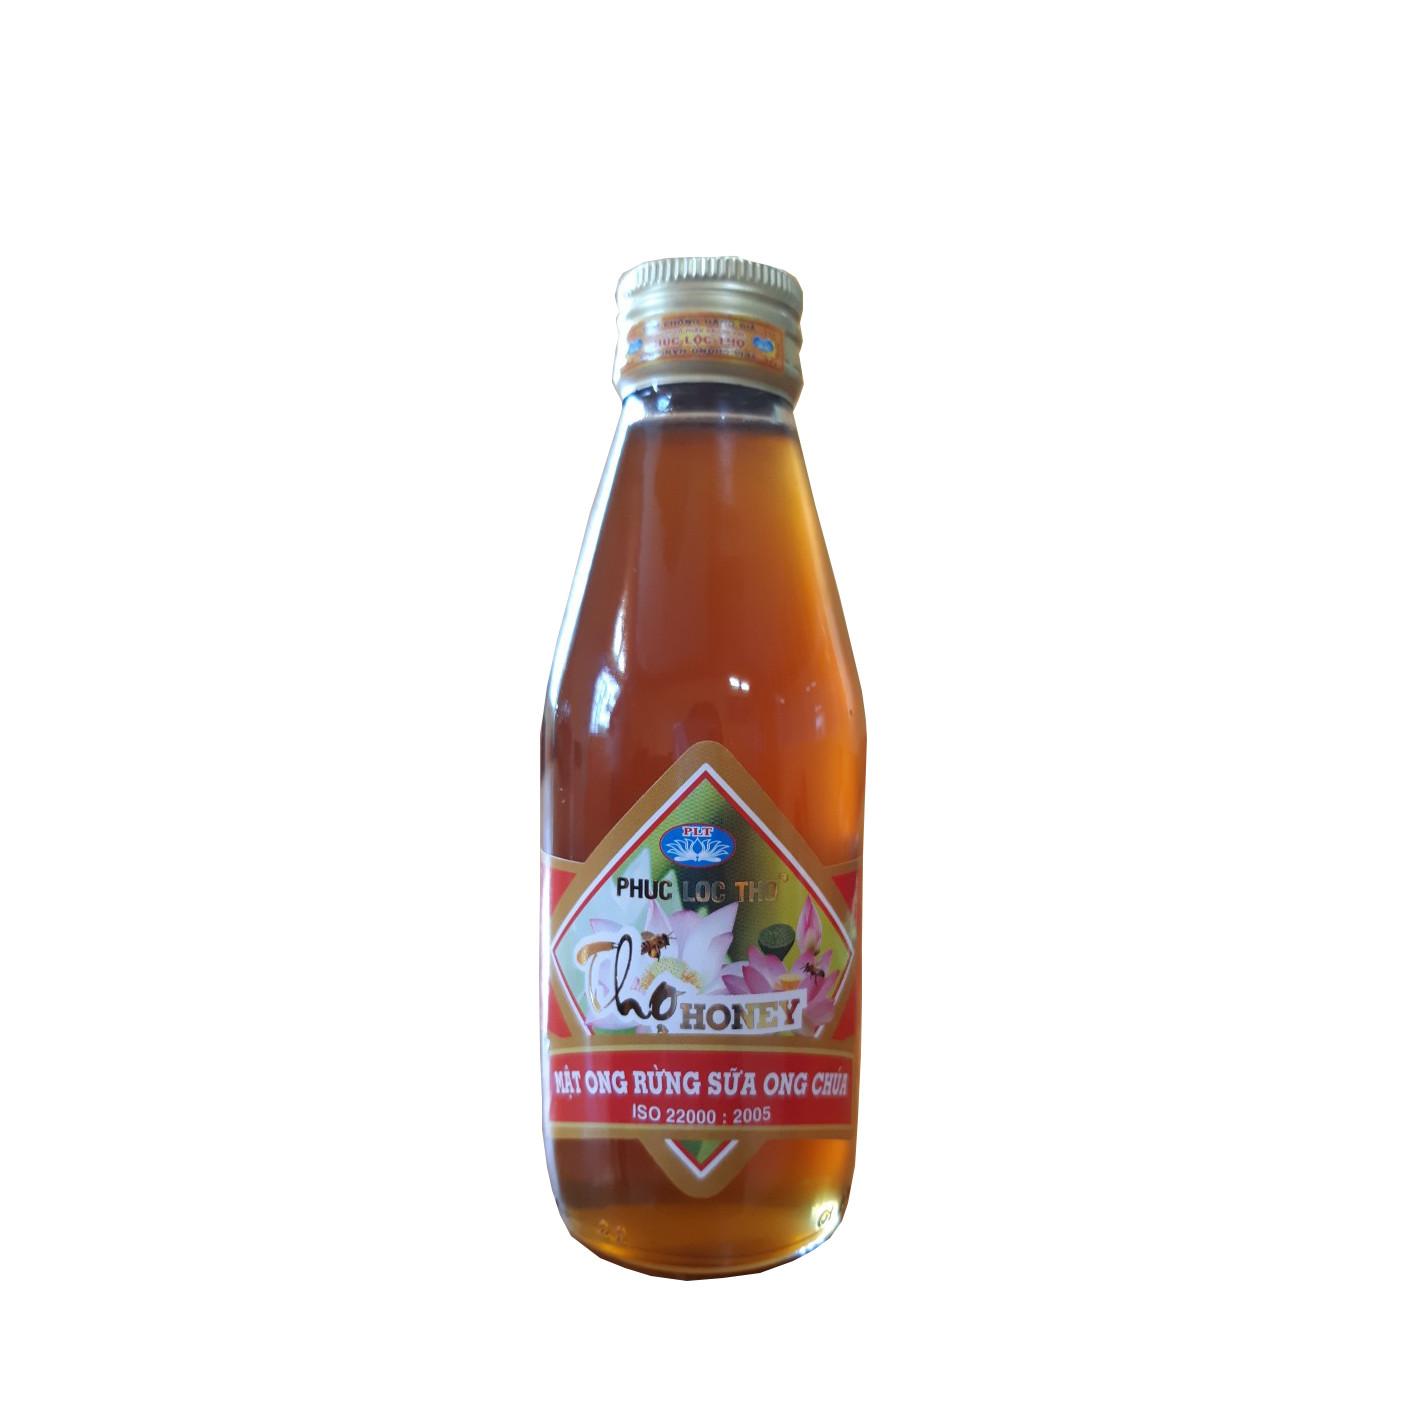 Mật ong rừng sữa ong chúa - 200 ml - 23809739 , 3648570989744 , 62_23485582 , 170000 , Mat-ong-rung-sua-ong-chua-200-ml-62_23485582 , tiki.vn , Mật ong rừng sữa ong chúa - 200 ml